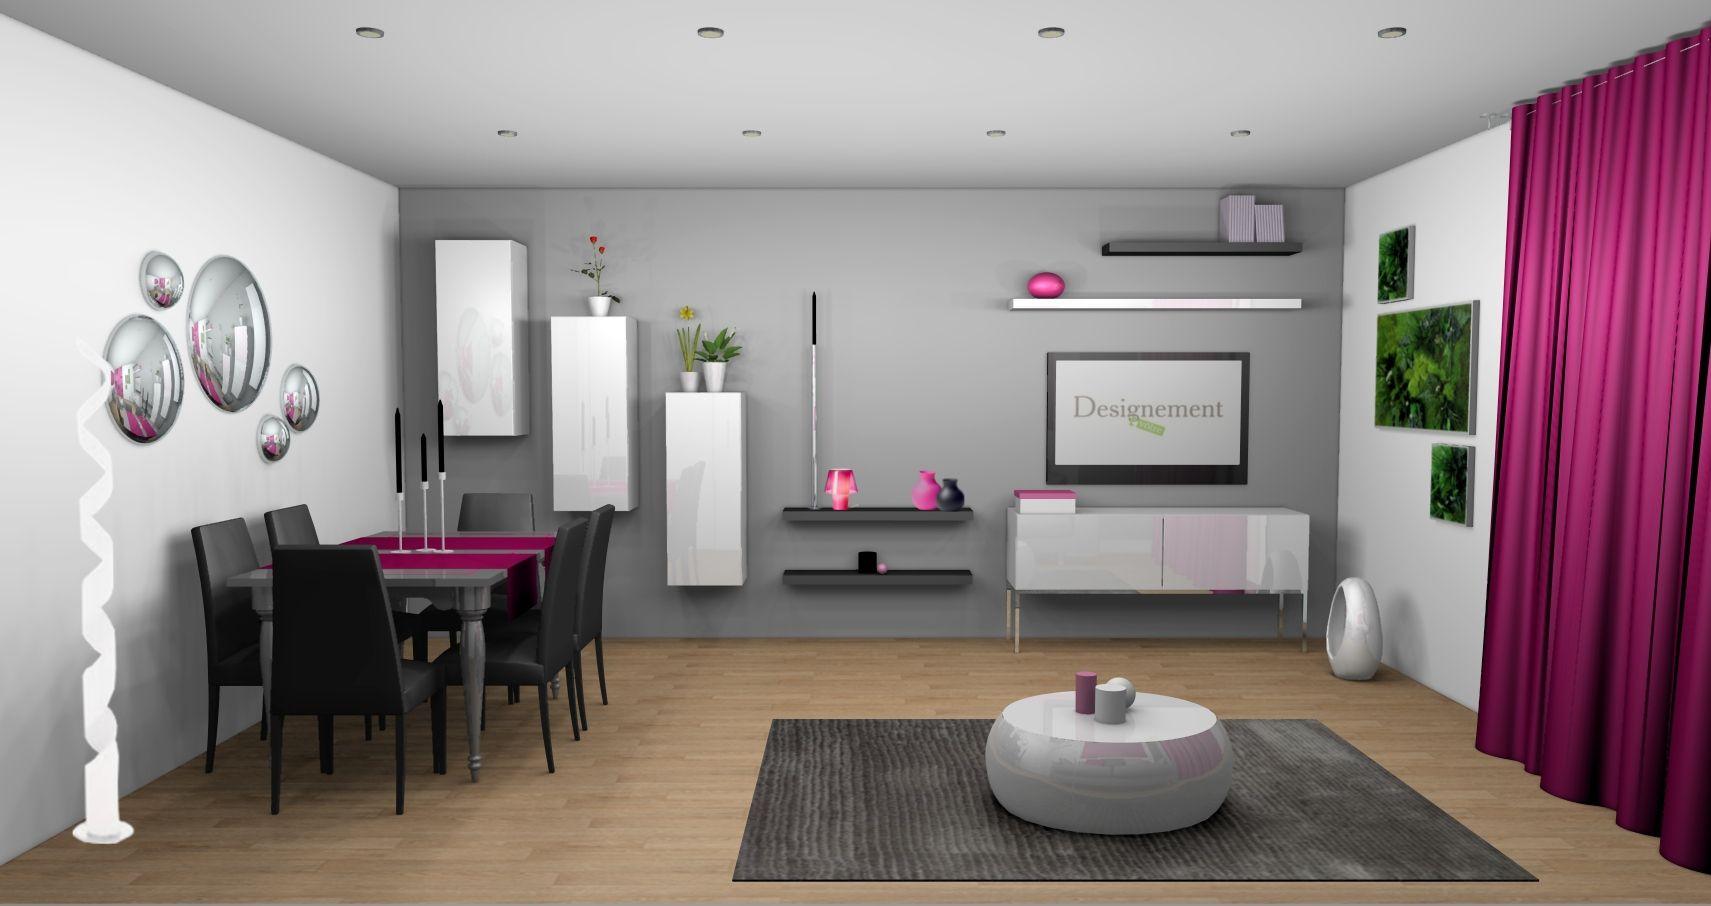 887AA1 Inspiration D C3 A9coration Interieur Salon Cocooning ...